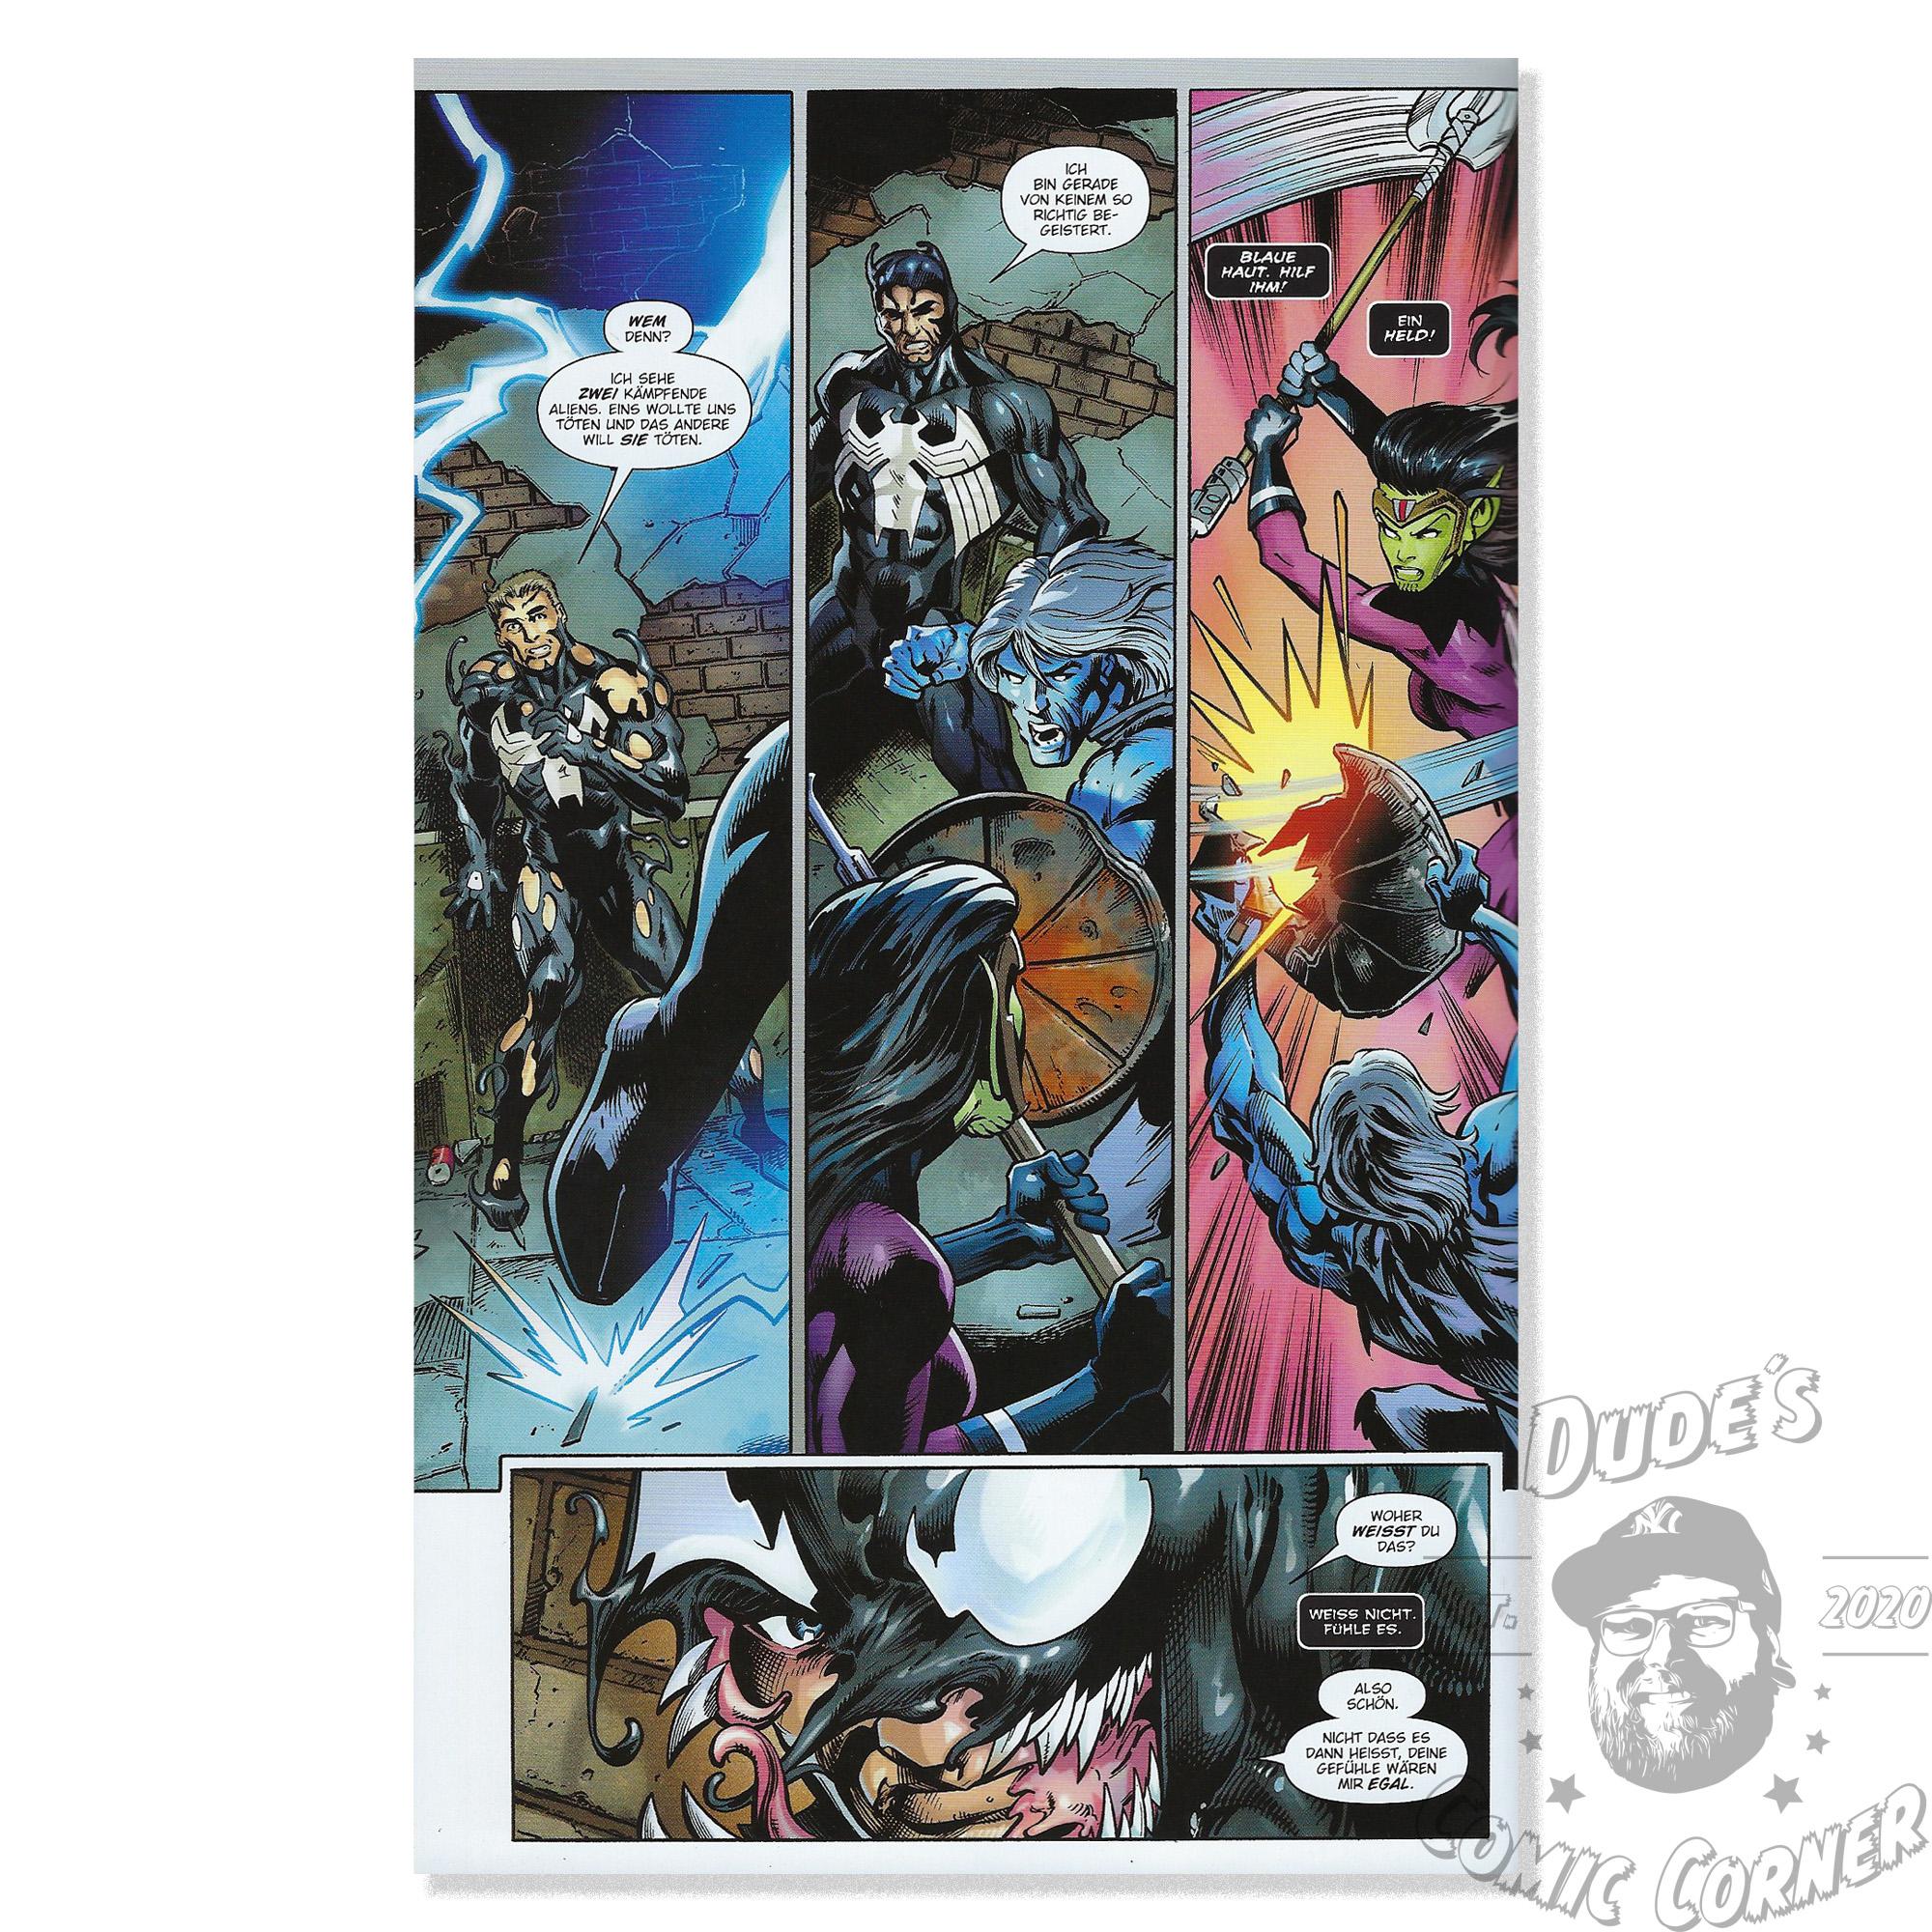 Erster Marvel Comic